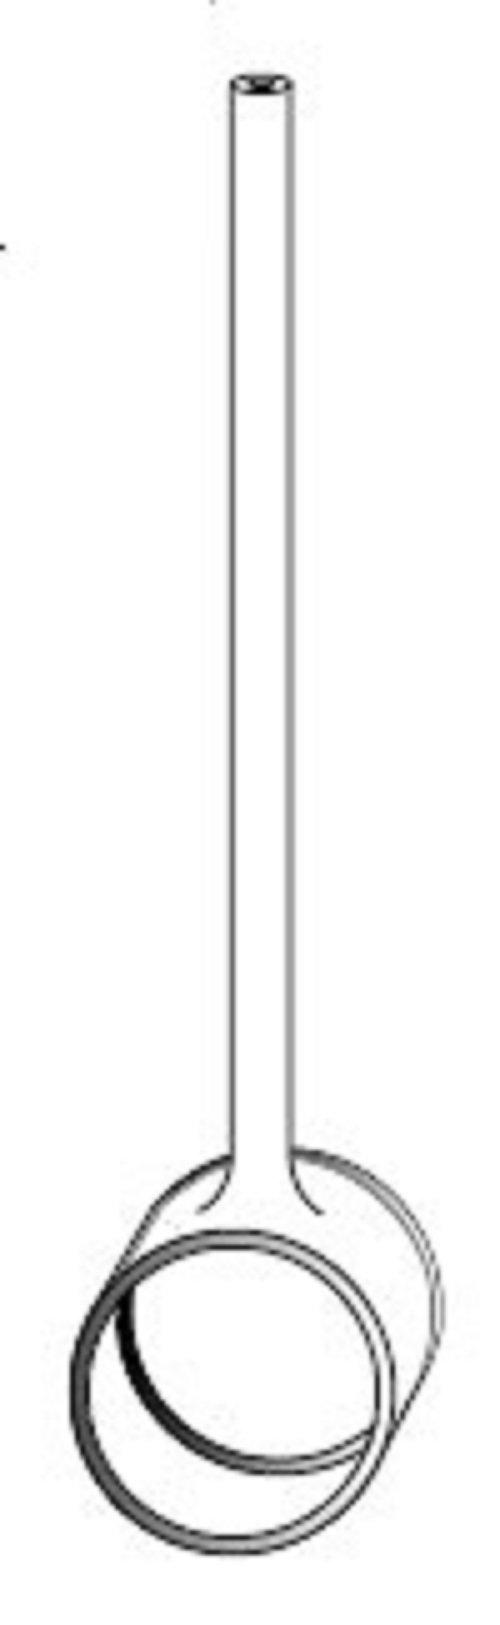 Cylindrical Quartz Cuvette with Quartz Tube, Light Path 20mm, Φ=19mm, Cuvettes, Cells